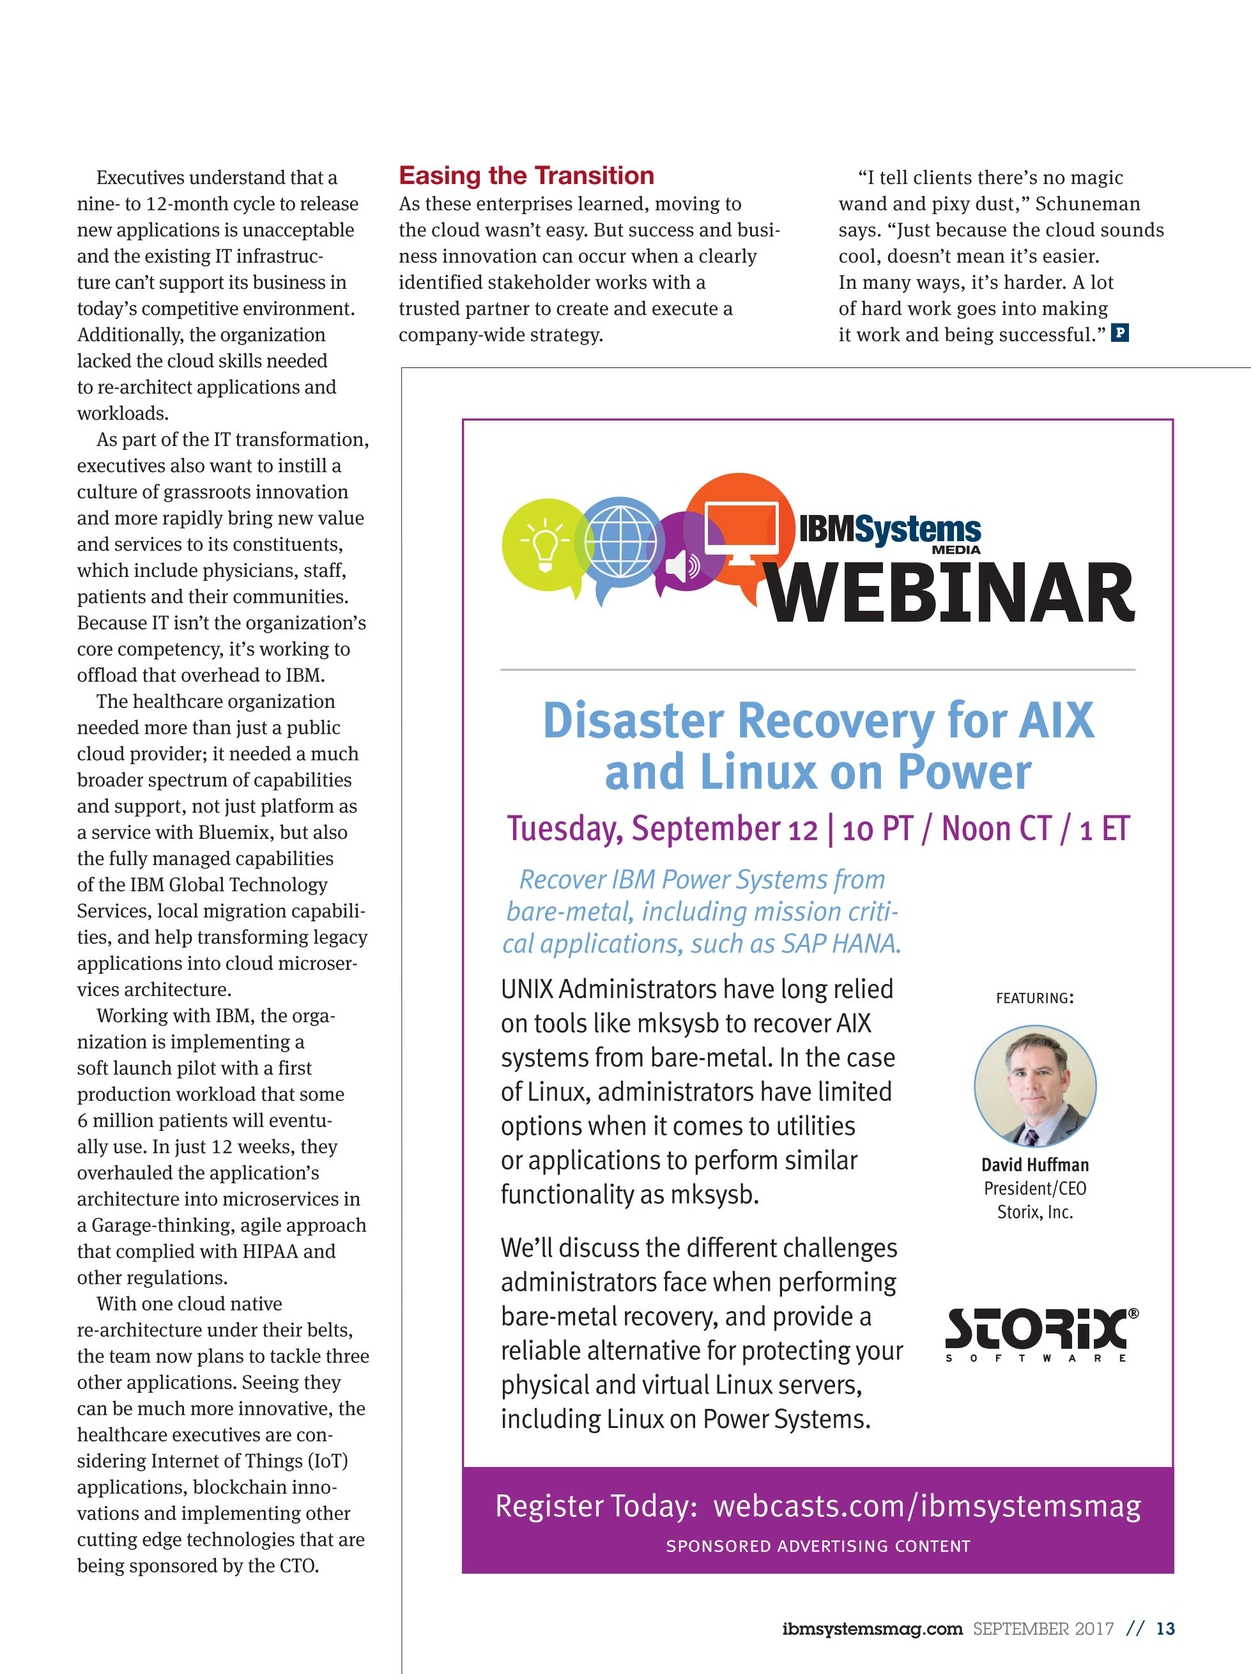 IBM Systems Magazine, Power Systems - September 2017